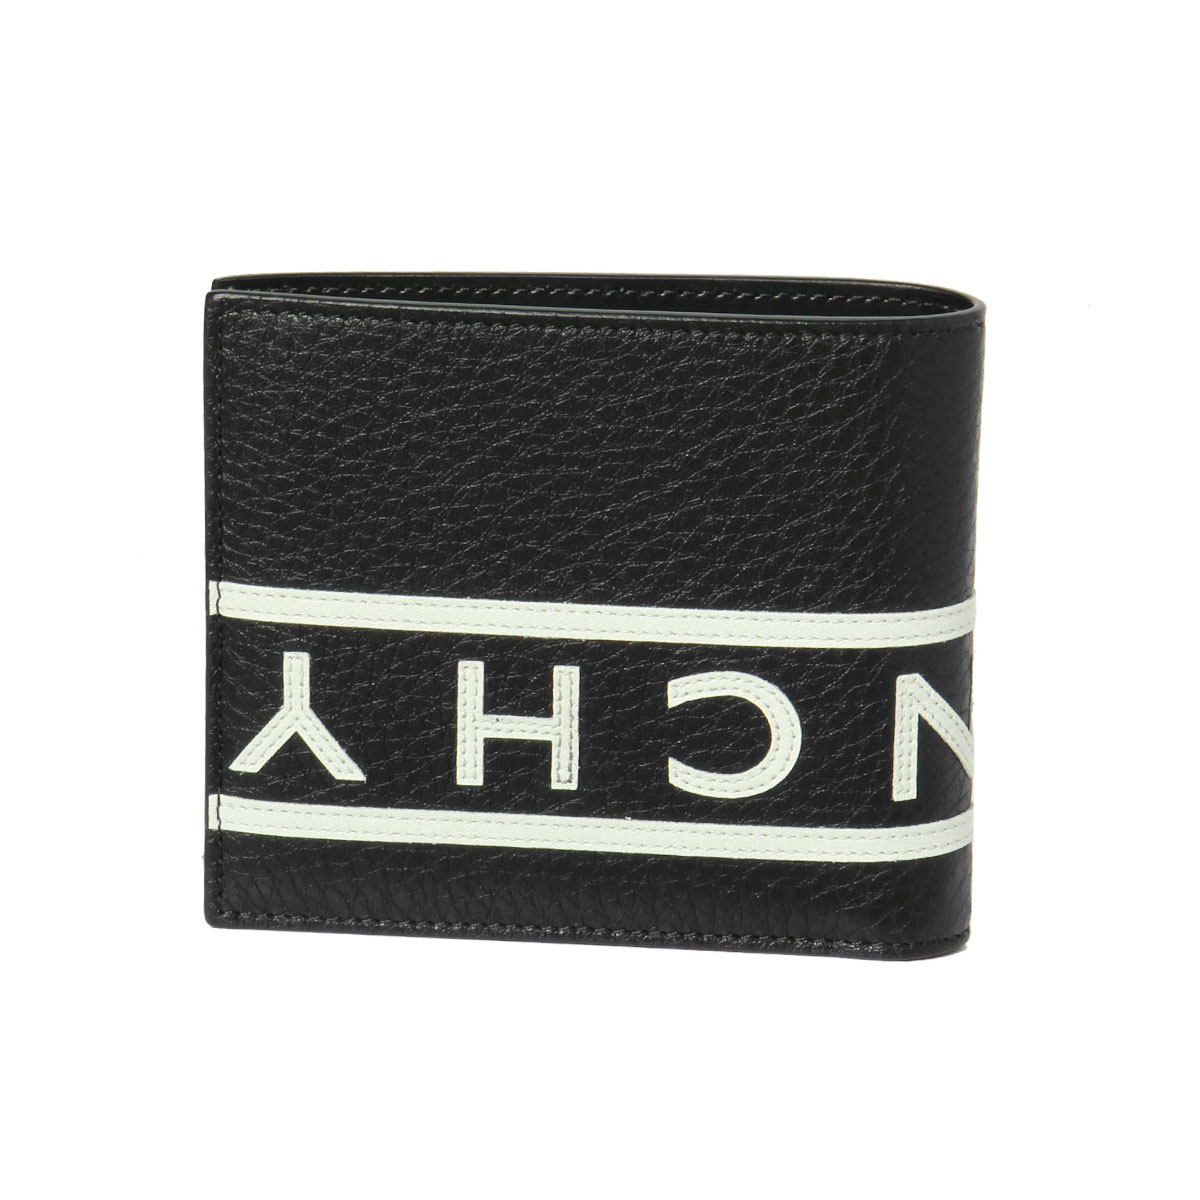 918583c3 Givenchy GIVENCHY wallet men BK6005K093 004 folio wallet BLACK/WHITE black